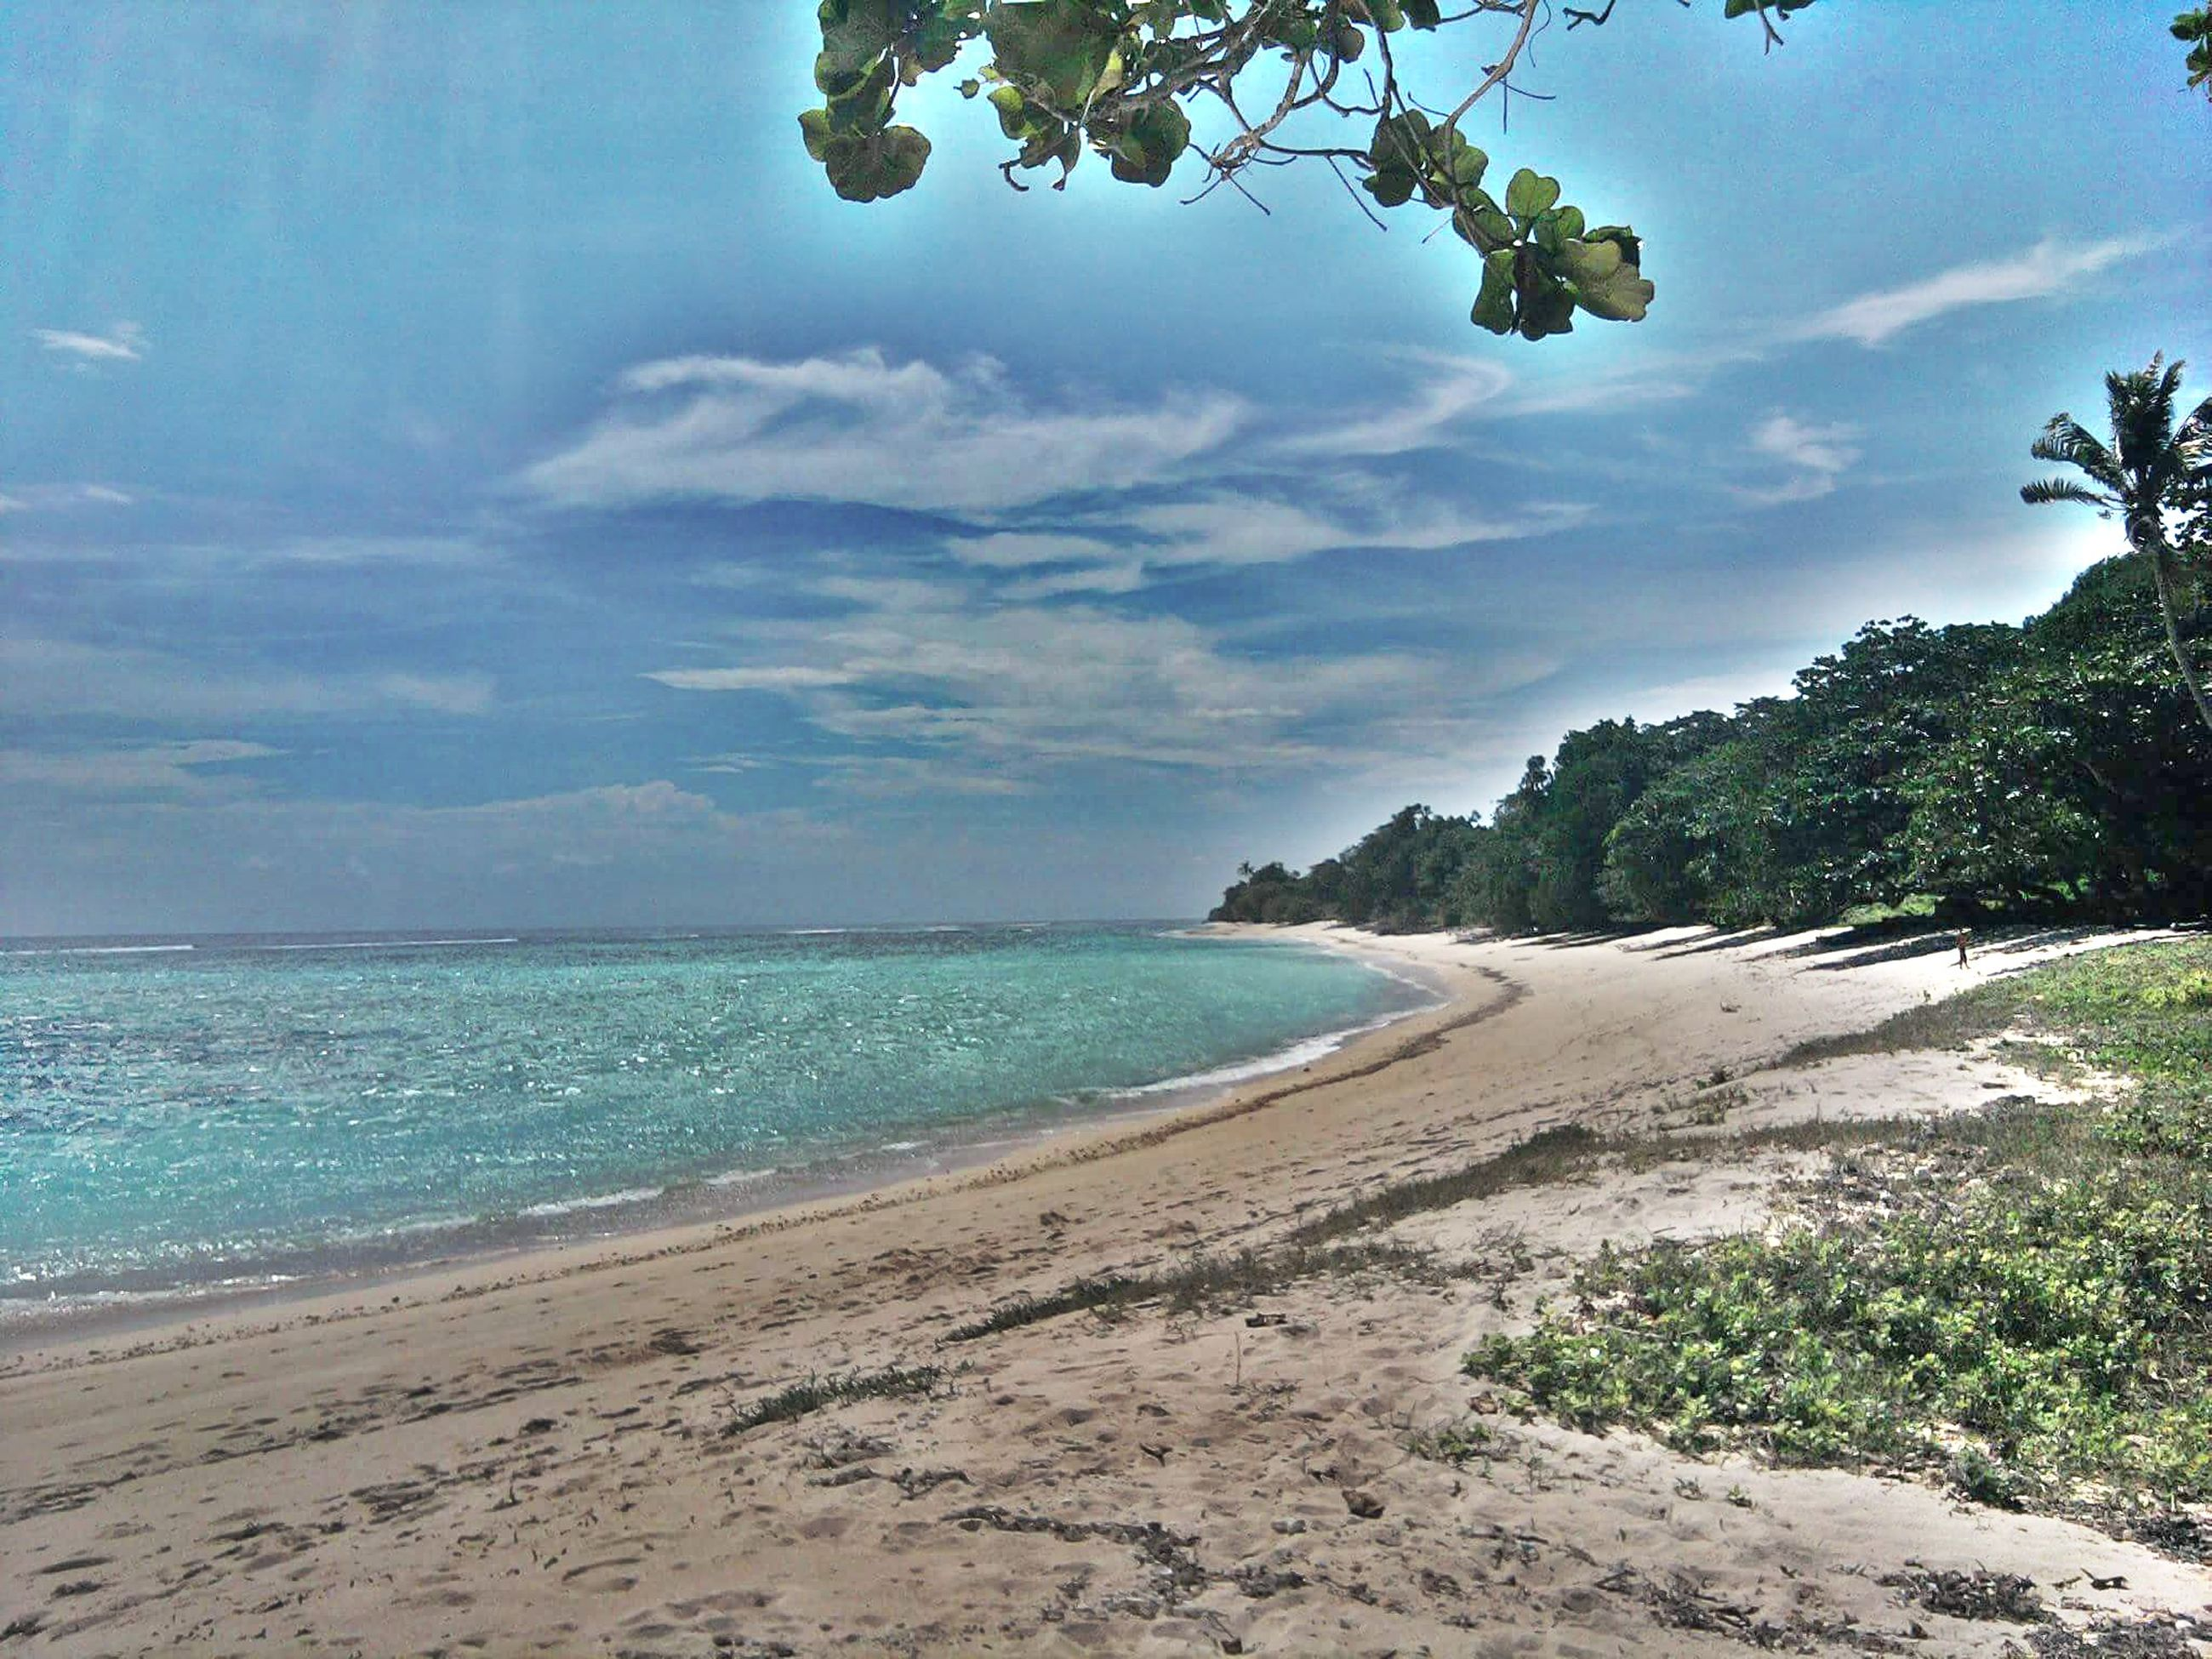 sea, beach, sky, water, tranquil scene, tranquility, sand, horizon over water, shore, scenics, beauty in nature, nature, cloud - sky, tree, cloud, coastline, idyllic, blue, day, calm